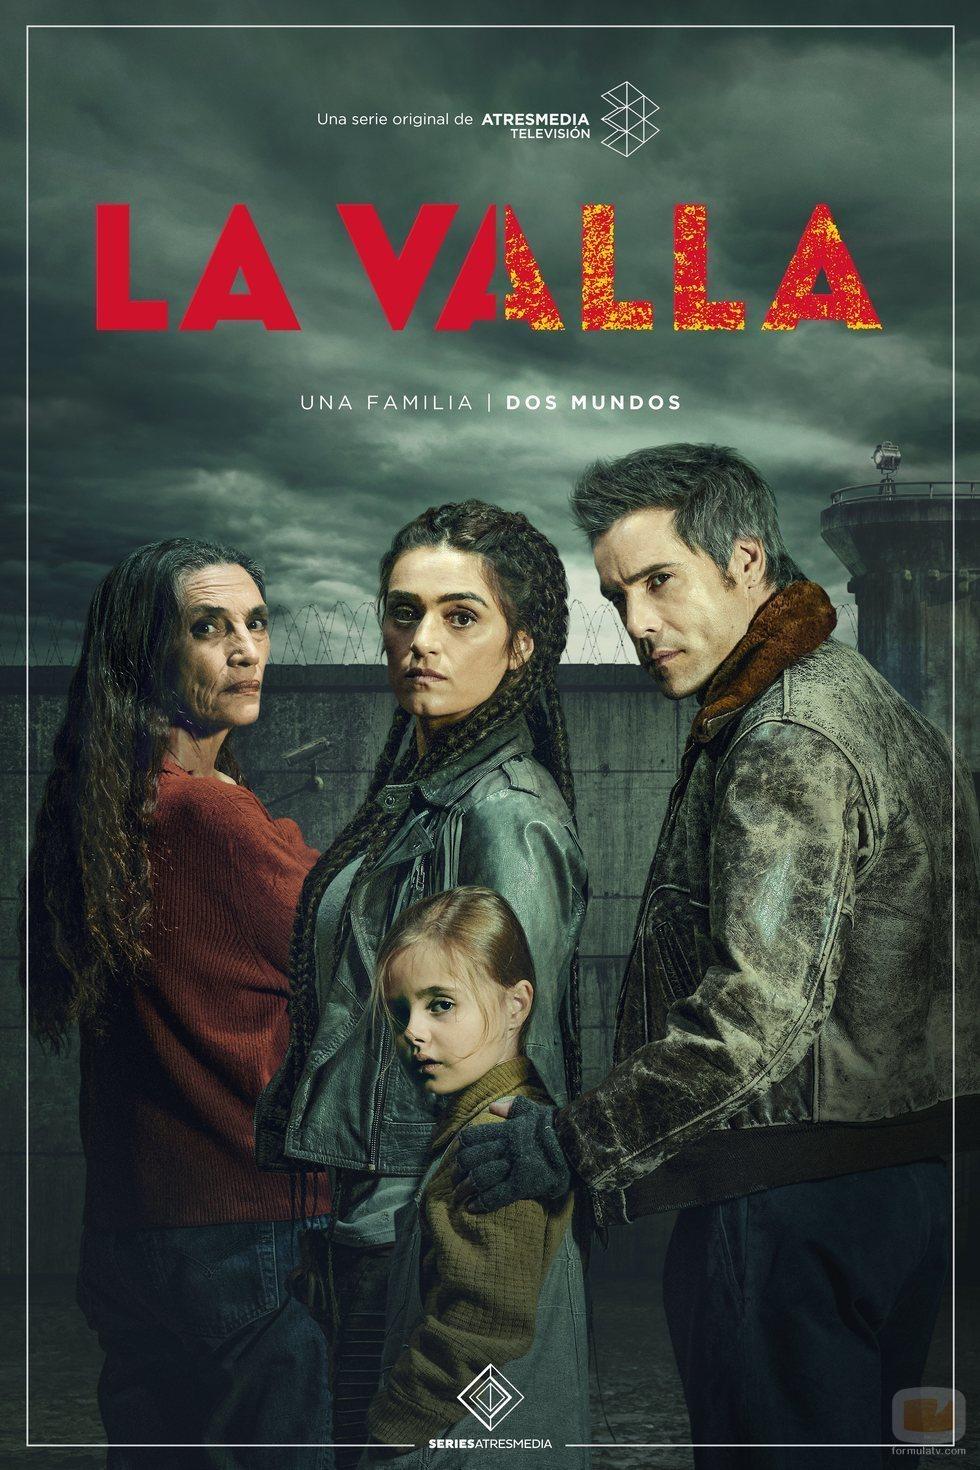 Póster promocional de 'La valla', serie de Atresmedia